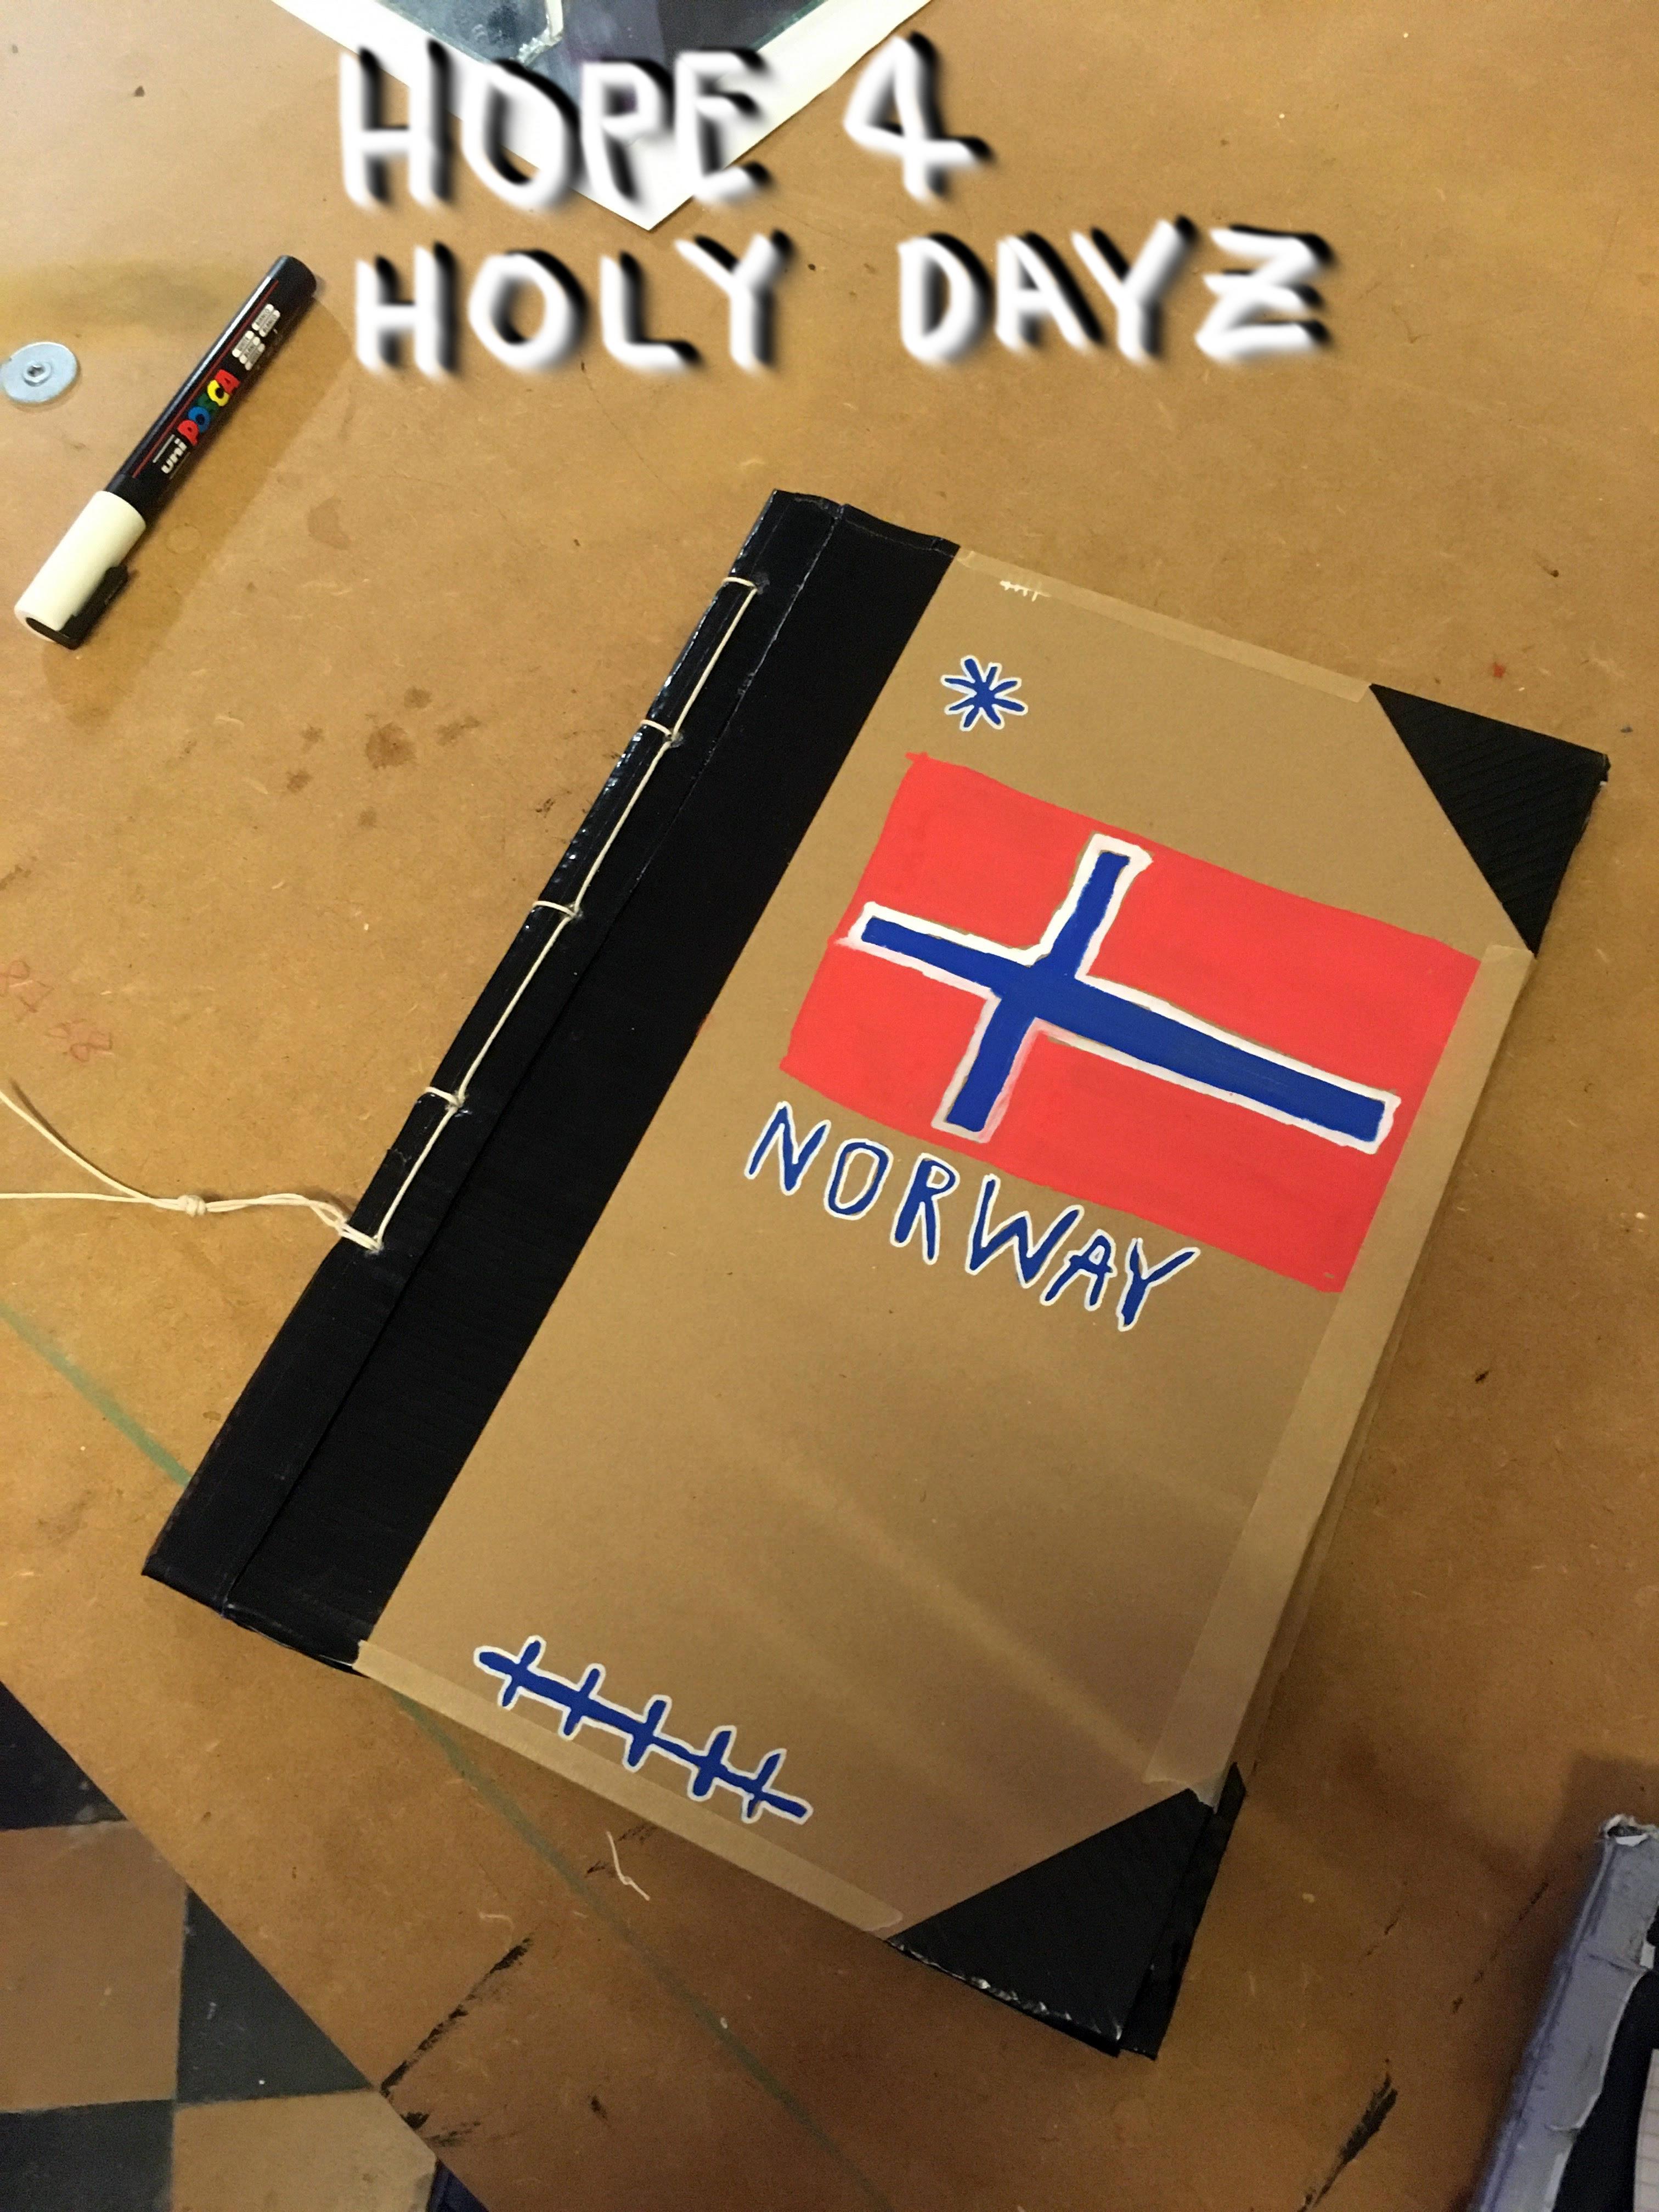 hope 4 holydayz